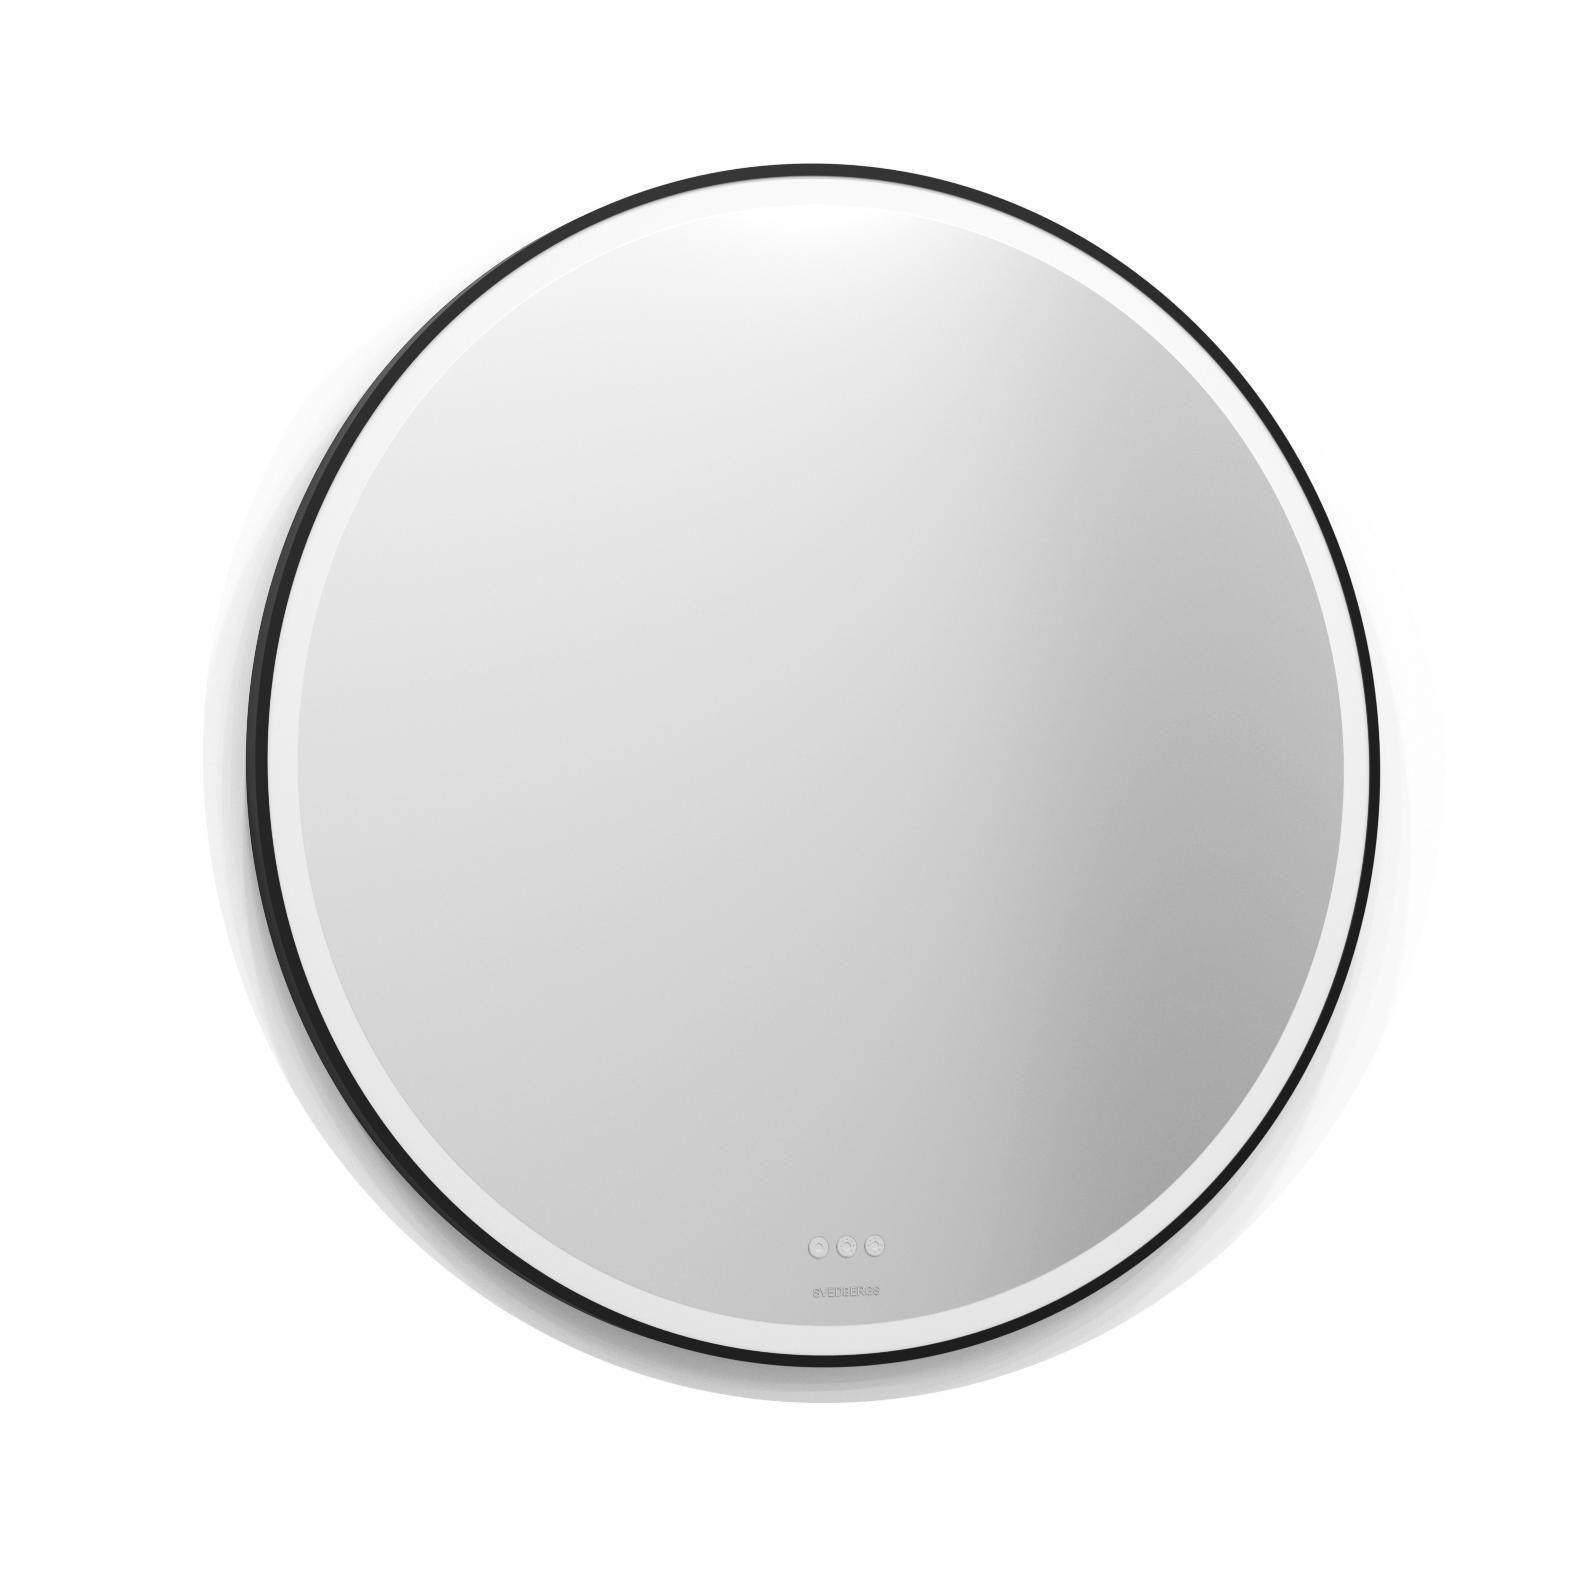 Spegel Svedbergs Ista Rund Ram med LED Belysning